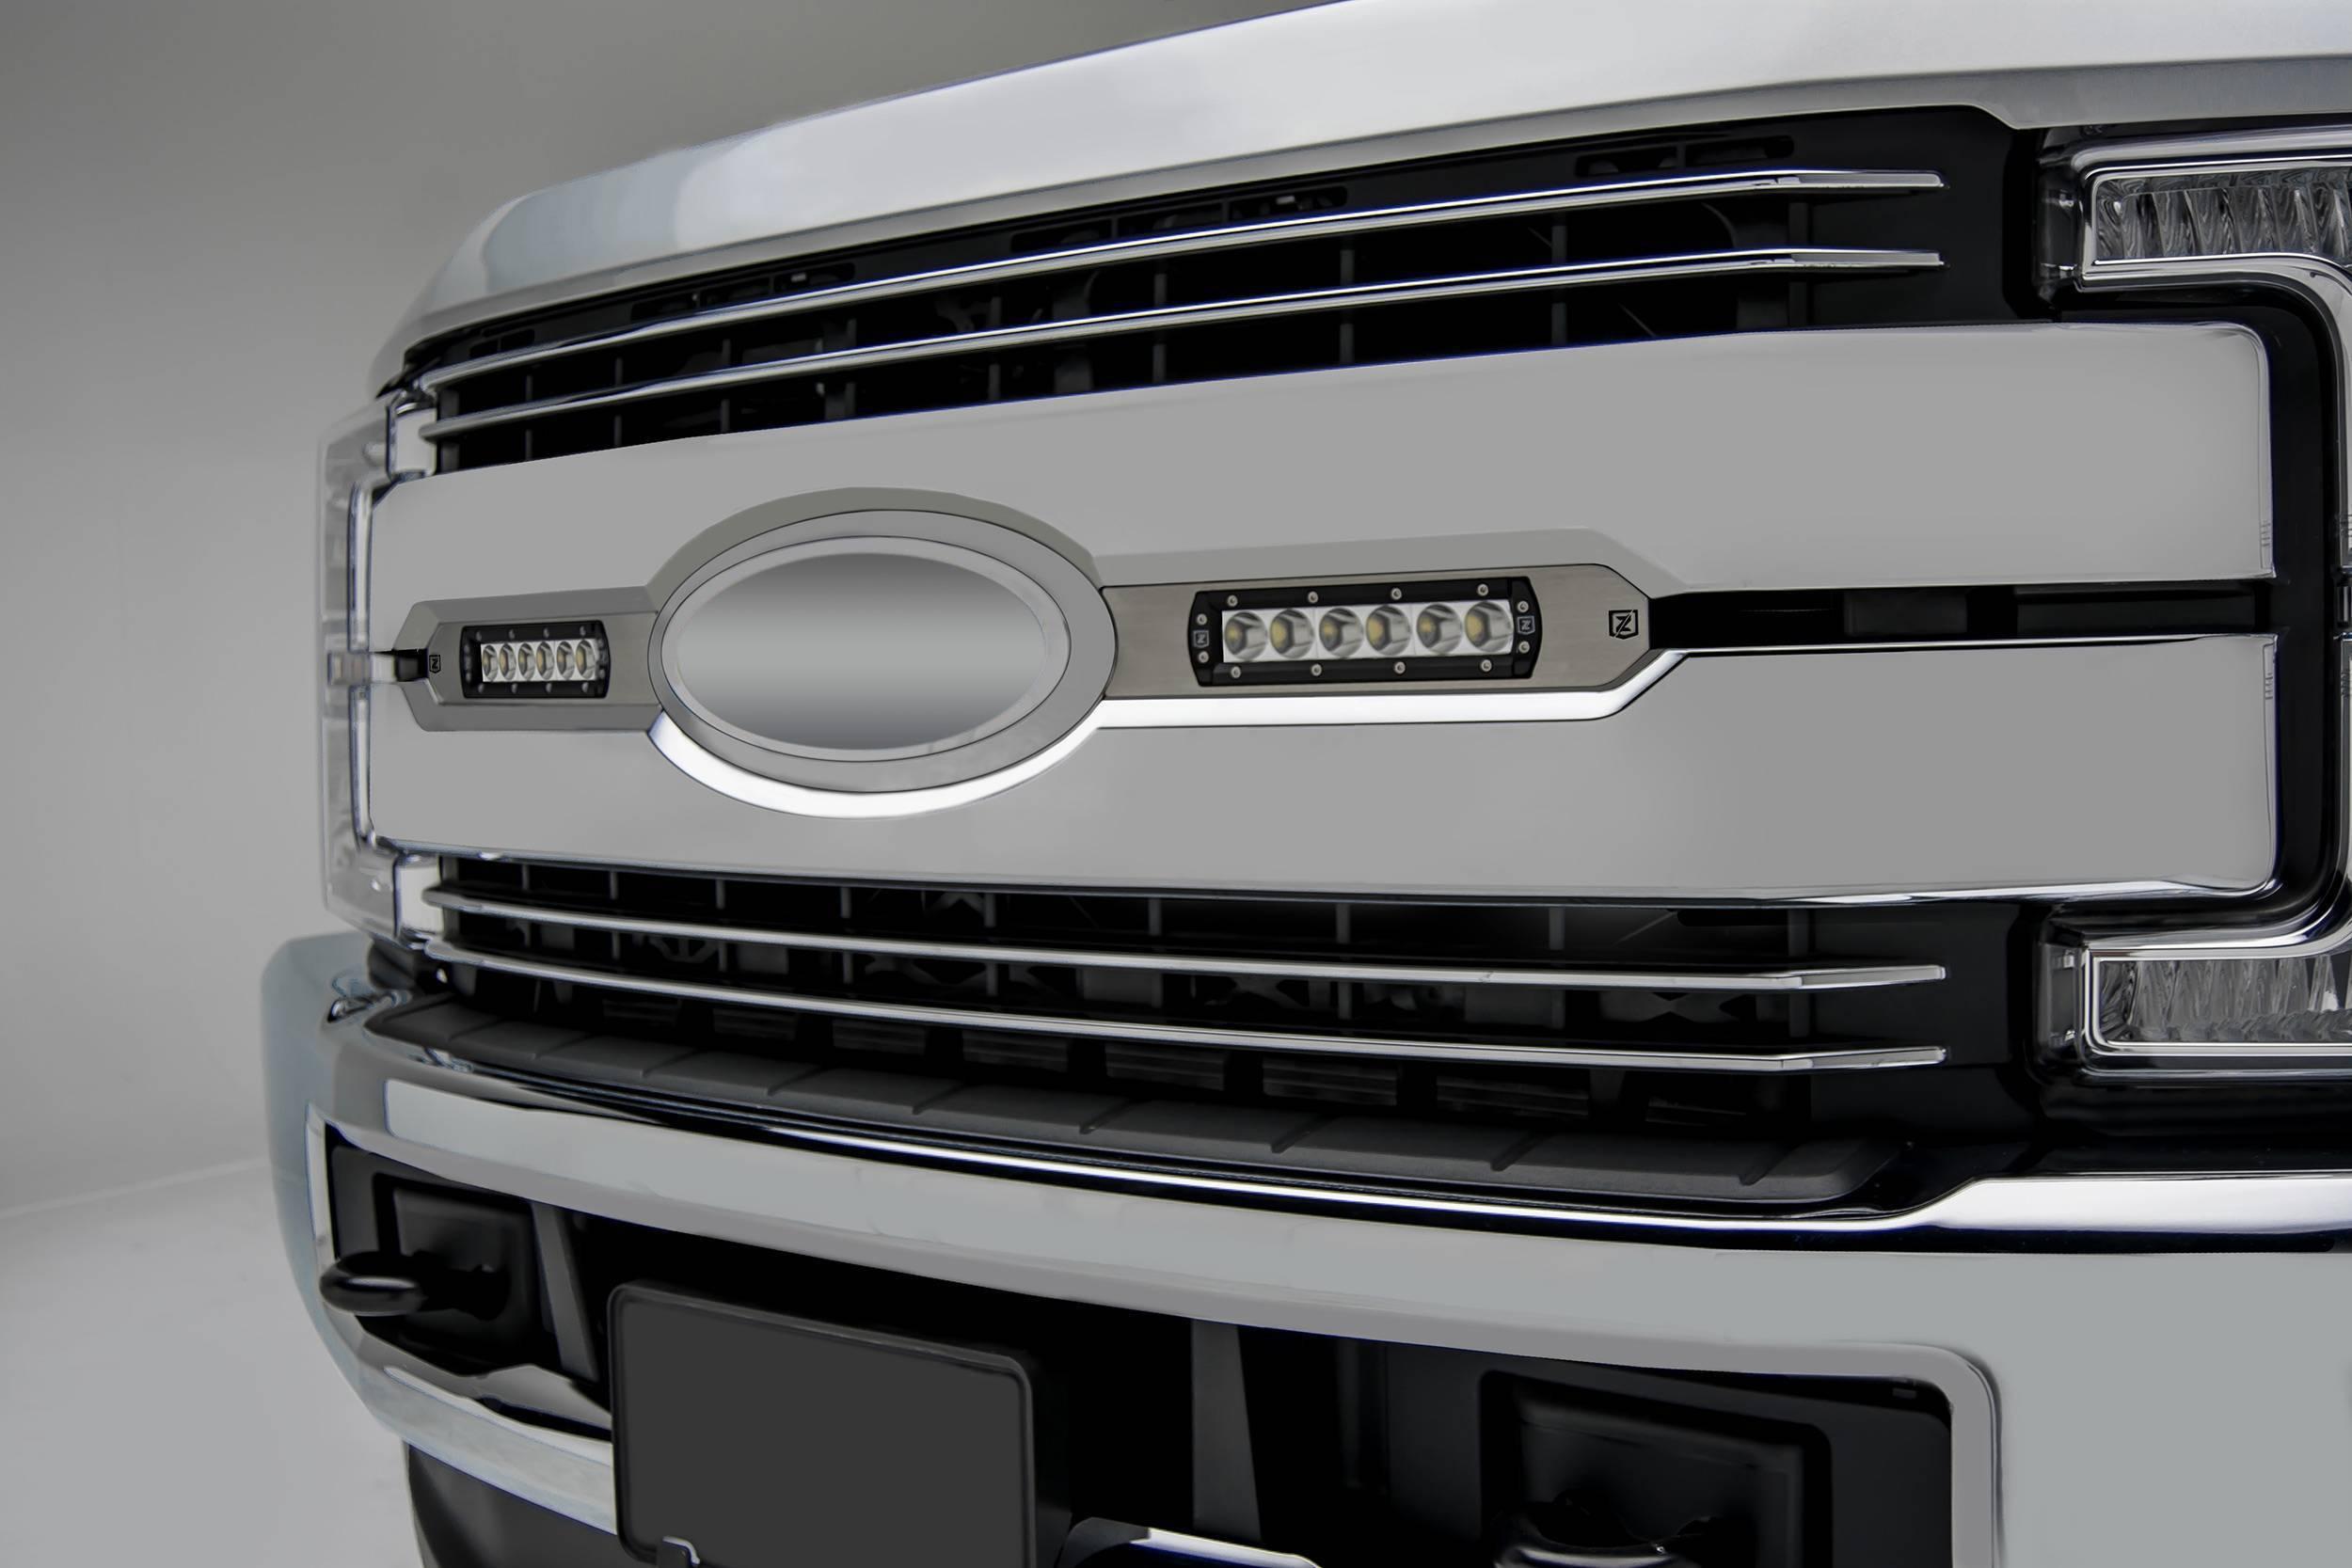 ZROADZ                                             - 2017-2019 Ford Super Duty Lariat, King Ranch OEM Grille LED Kit with (2) 6 Inch LED Straight Single Row Slim Light Bars - PN #Z415473-KIT